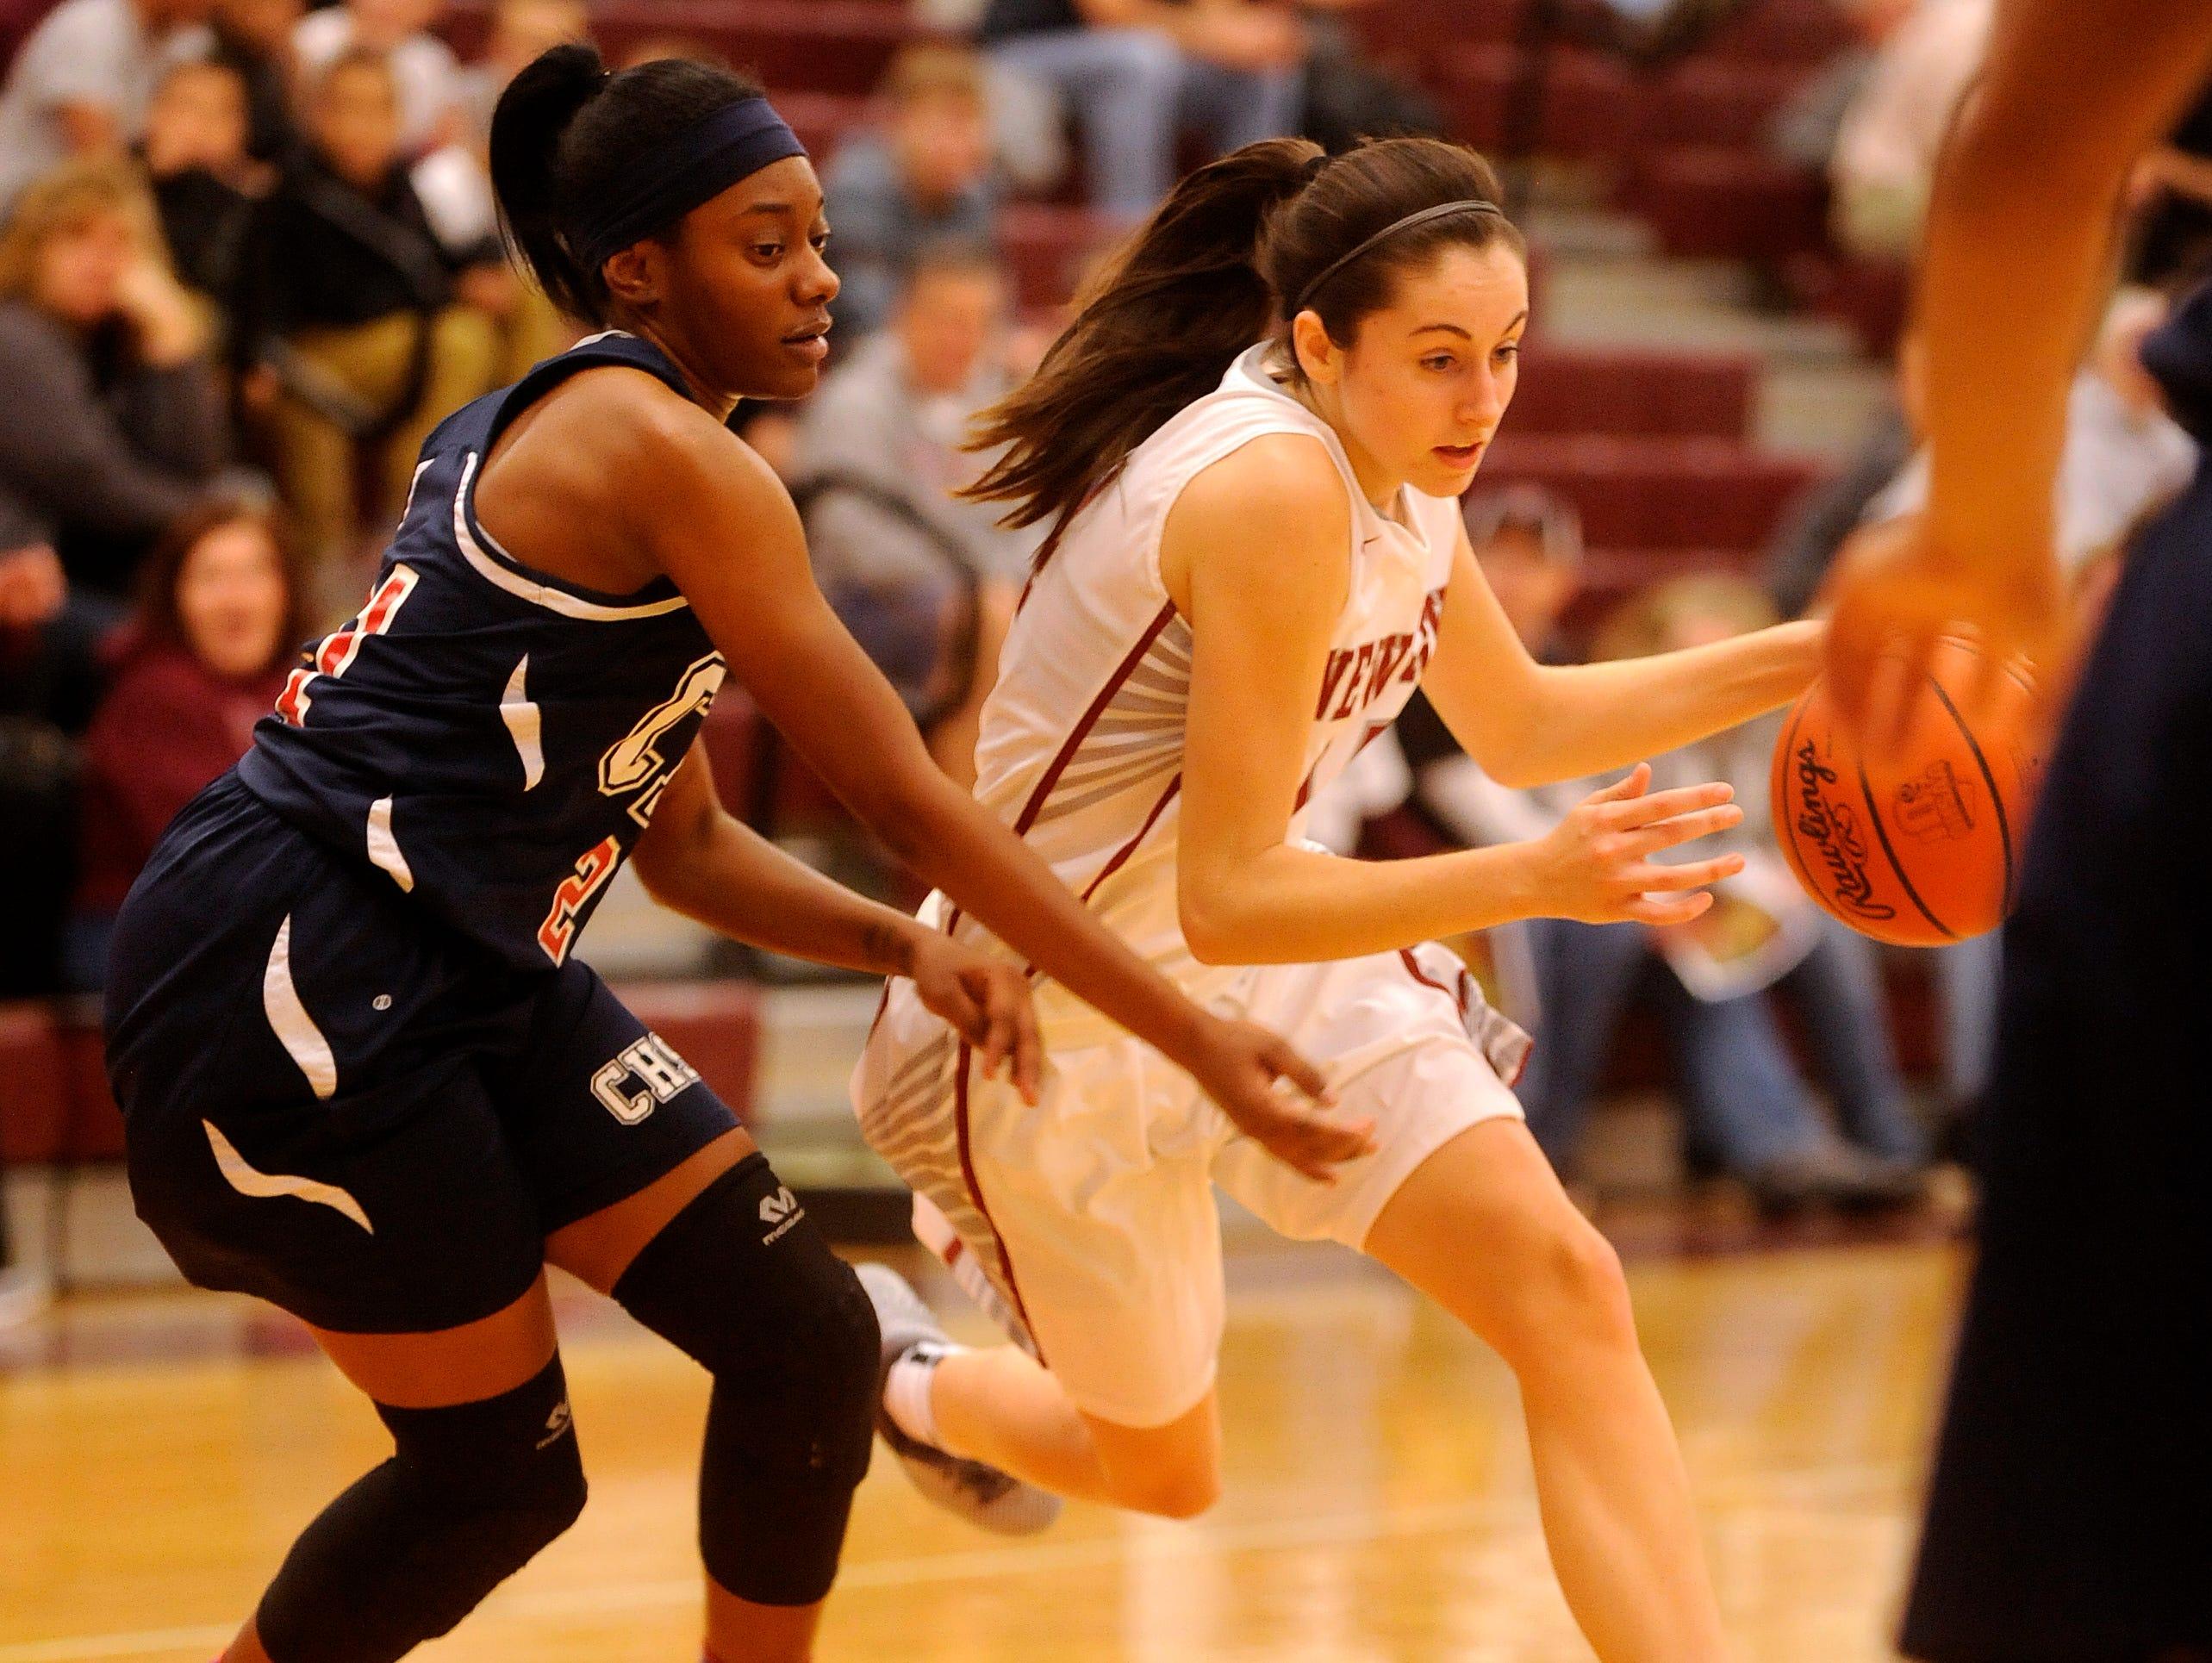 Newark's Katie Shumate dodges Centennial defenders Akiya Brown during an OHSAA Foundation Games on Tuesday, Nov. 17, 2015.